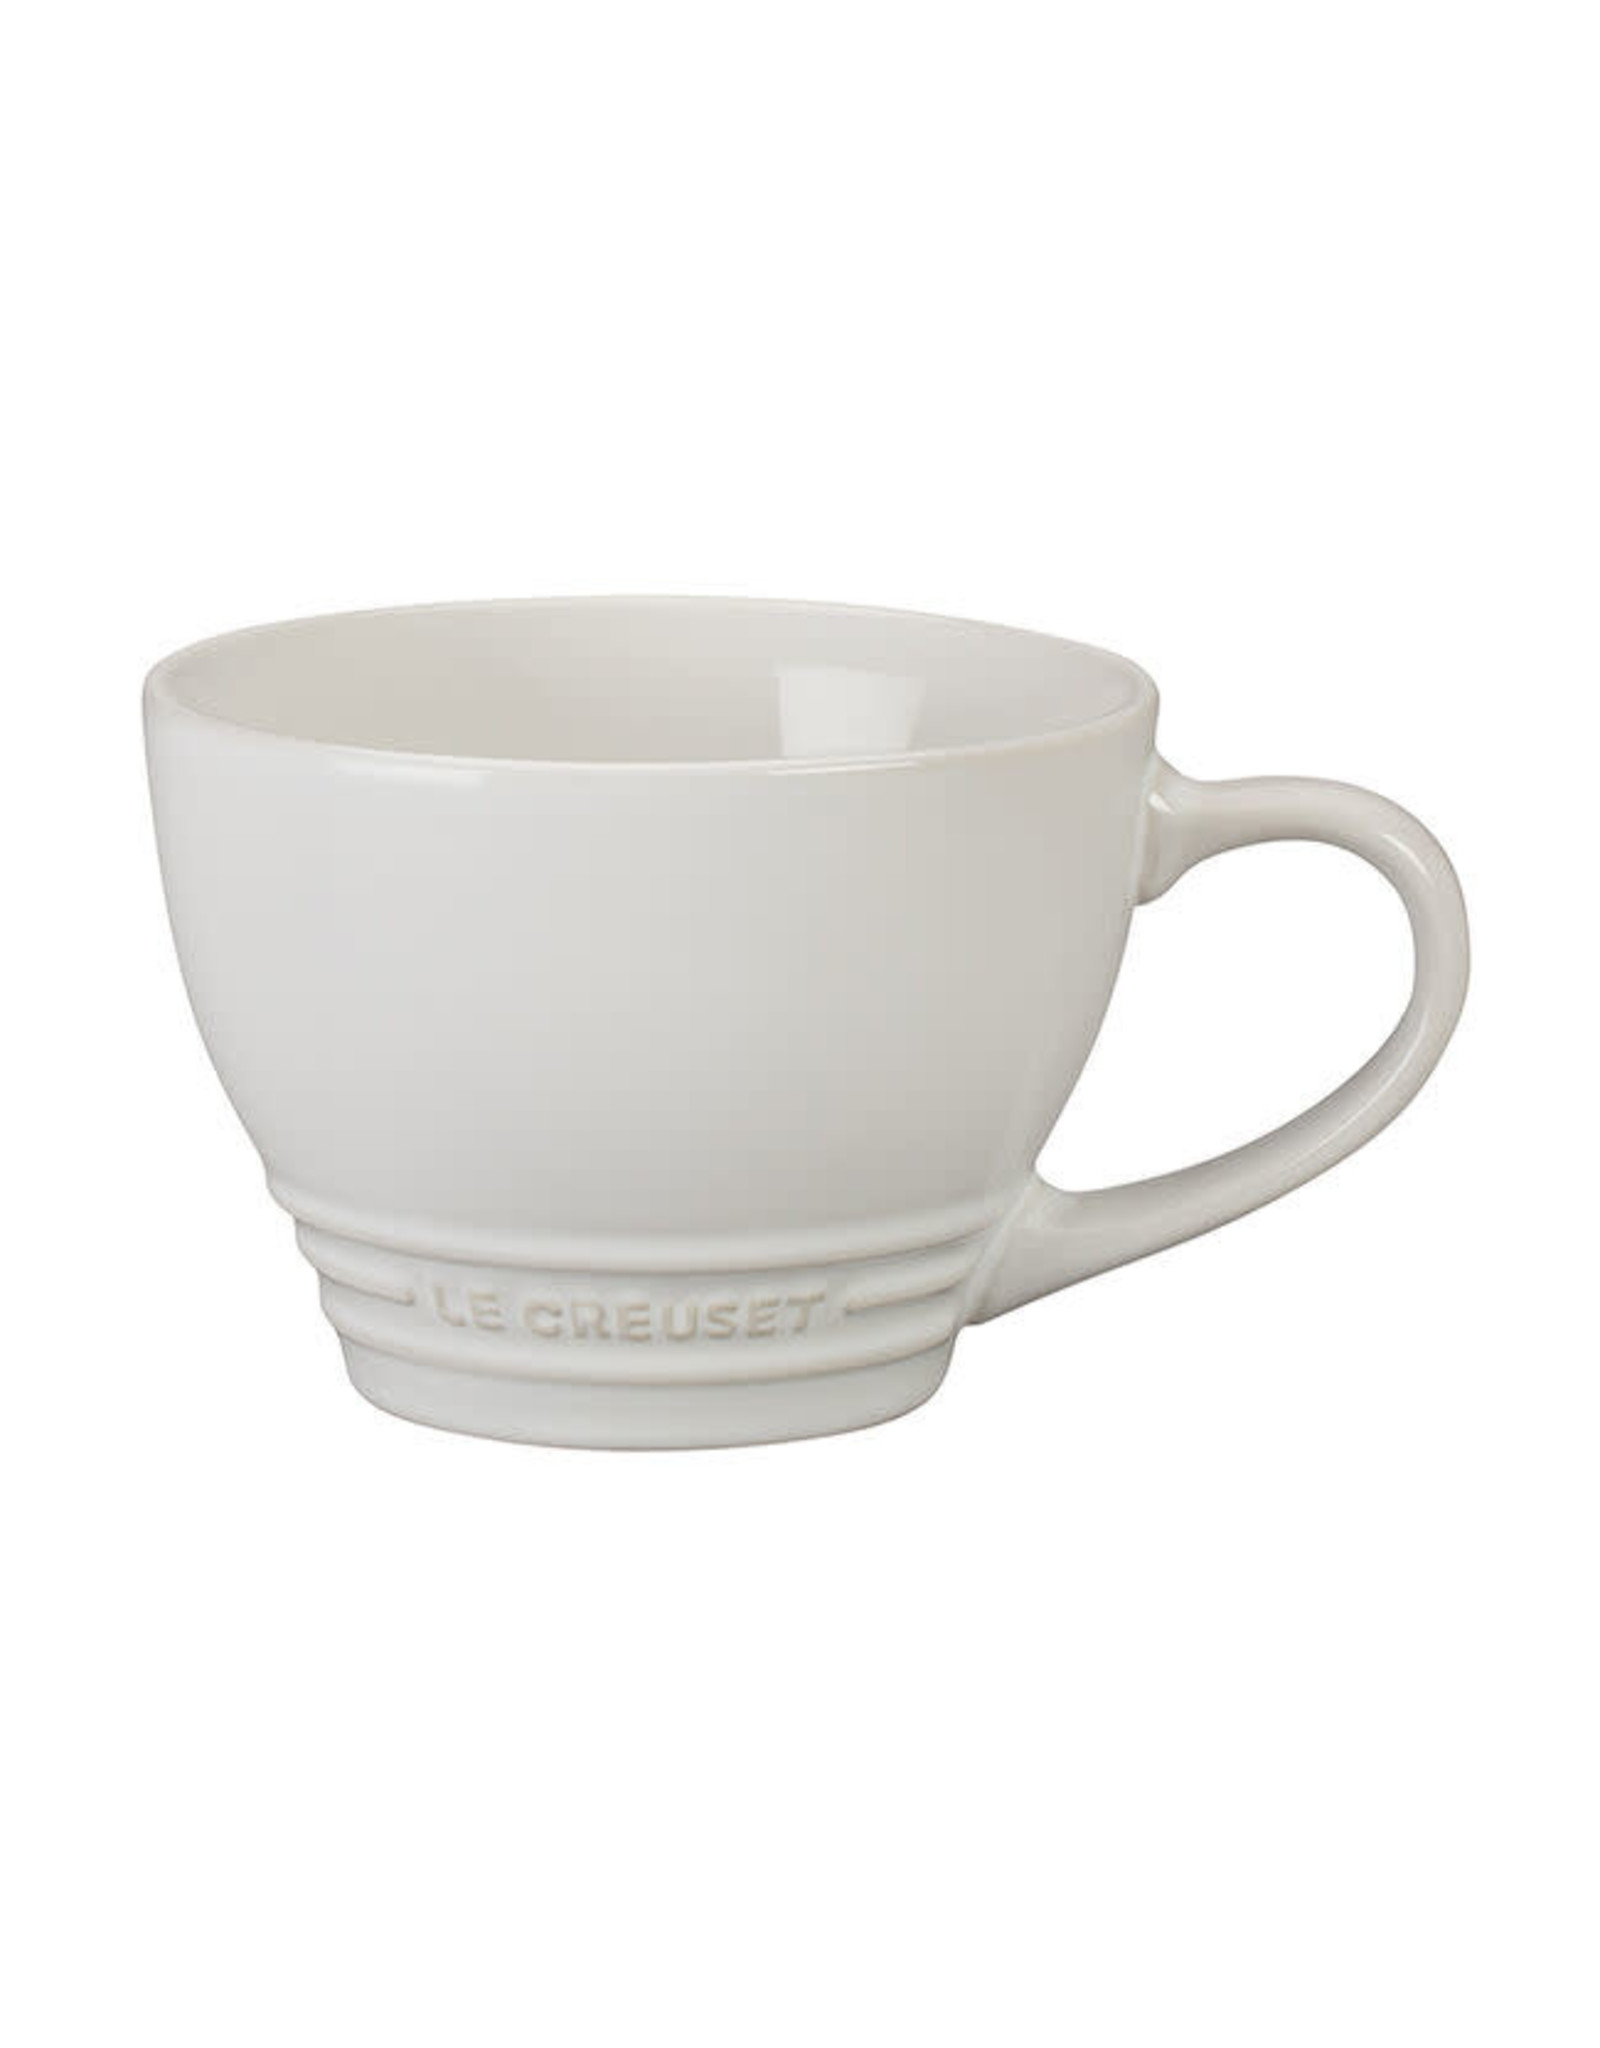 Le Creuset LE CREUSET- Bistro Mug 14oz White